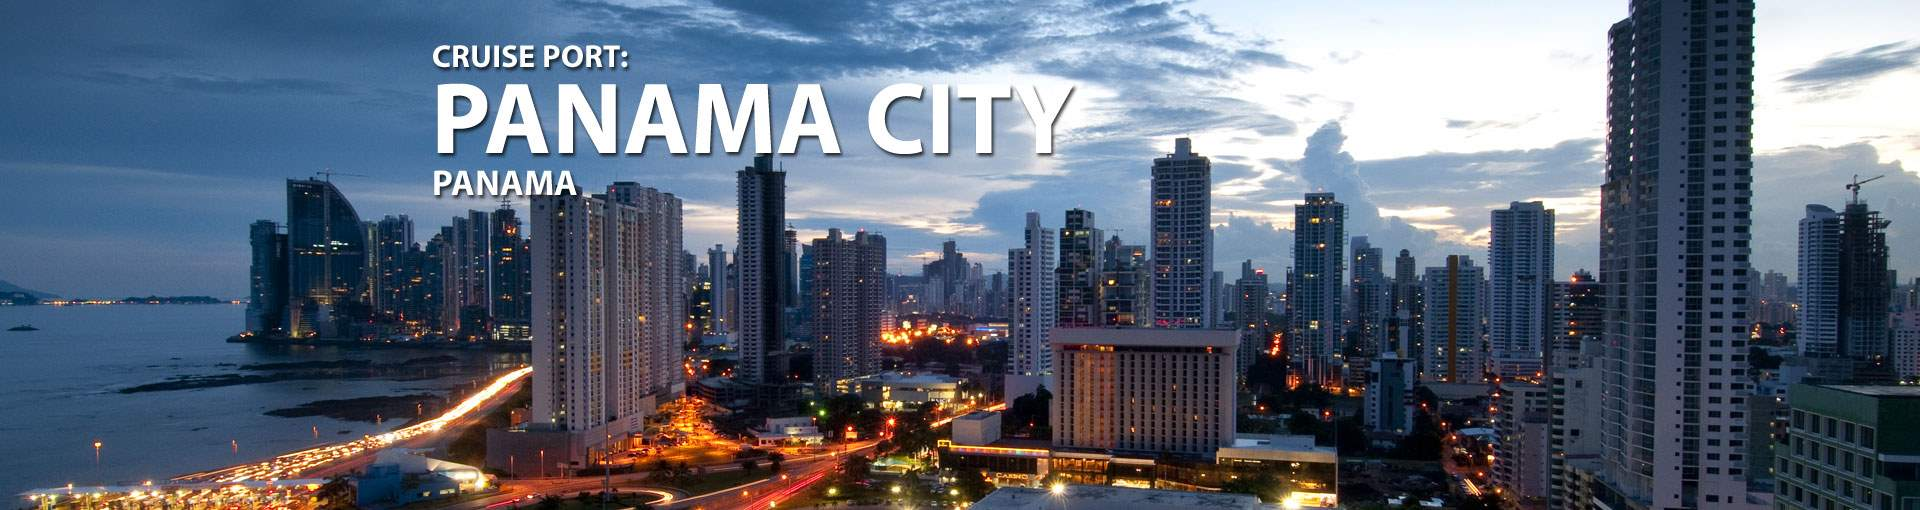 Cruises to Panama City, Panama